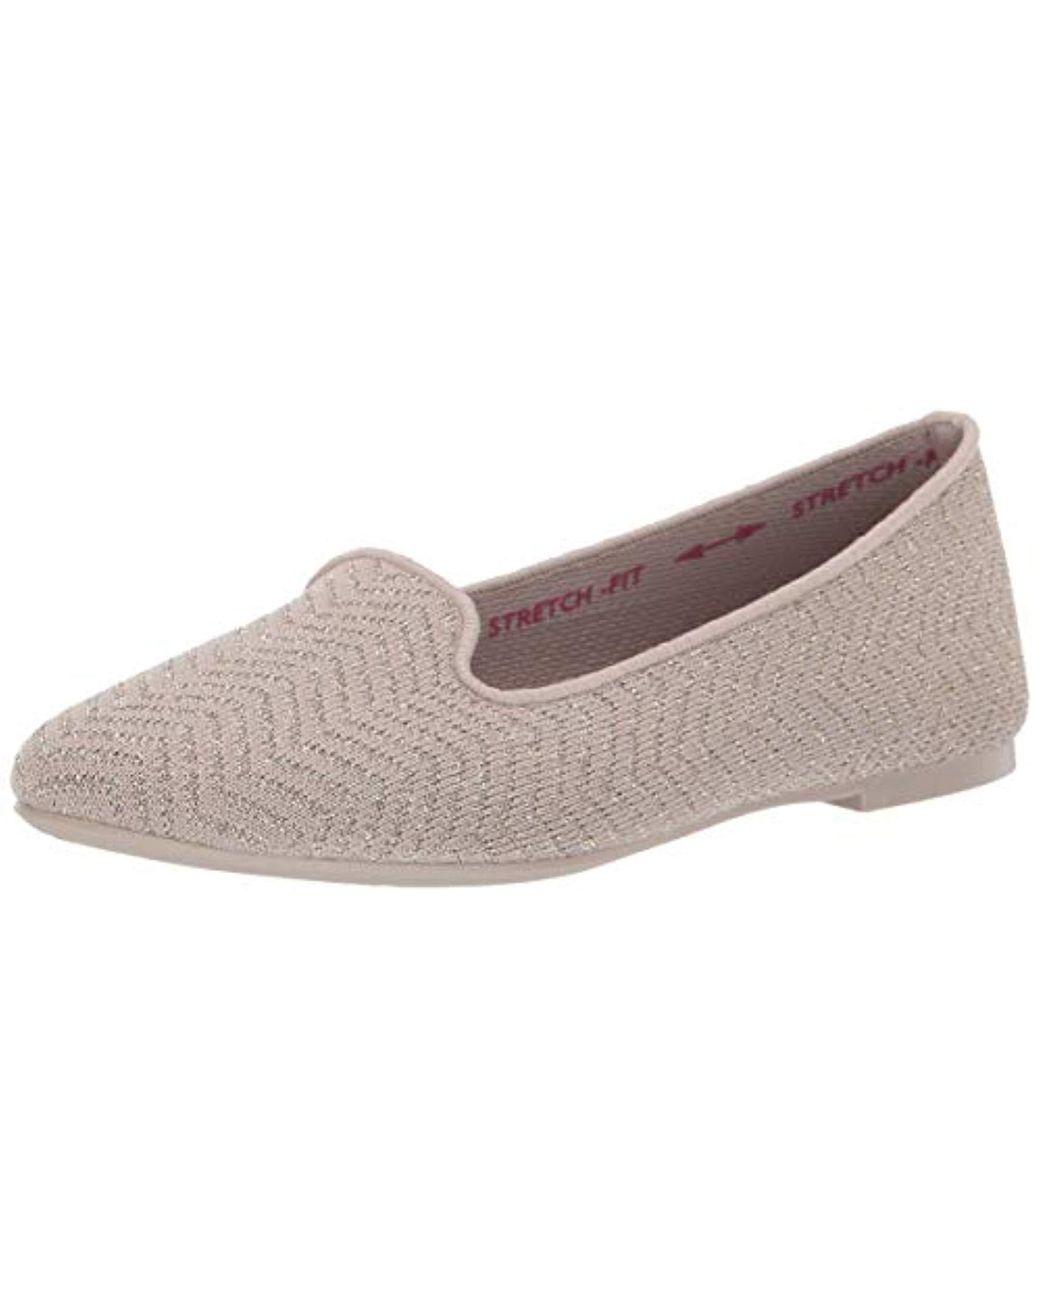 Women's Cleo-twist N Shout-metallic Engineered Knit Loafer Ballet Flat